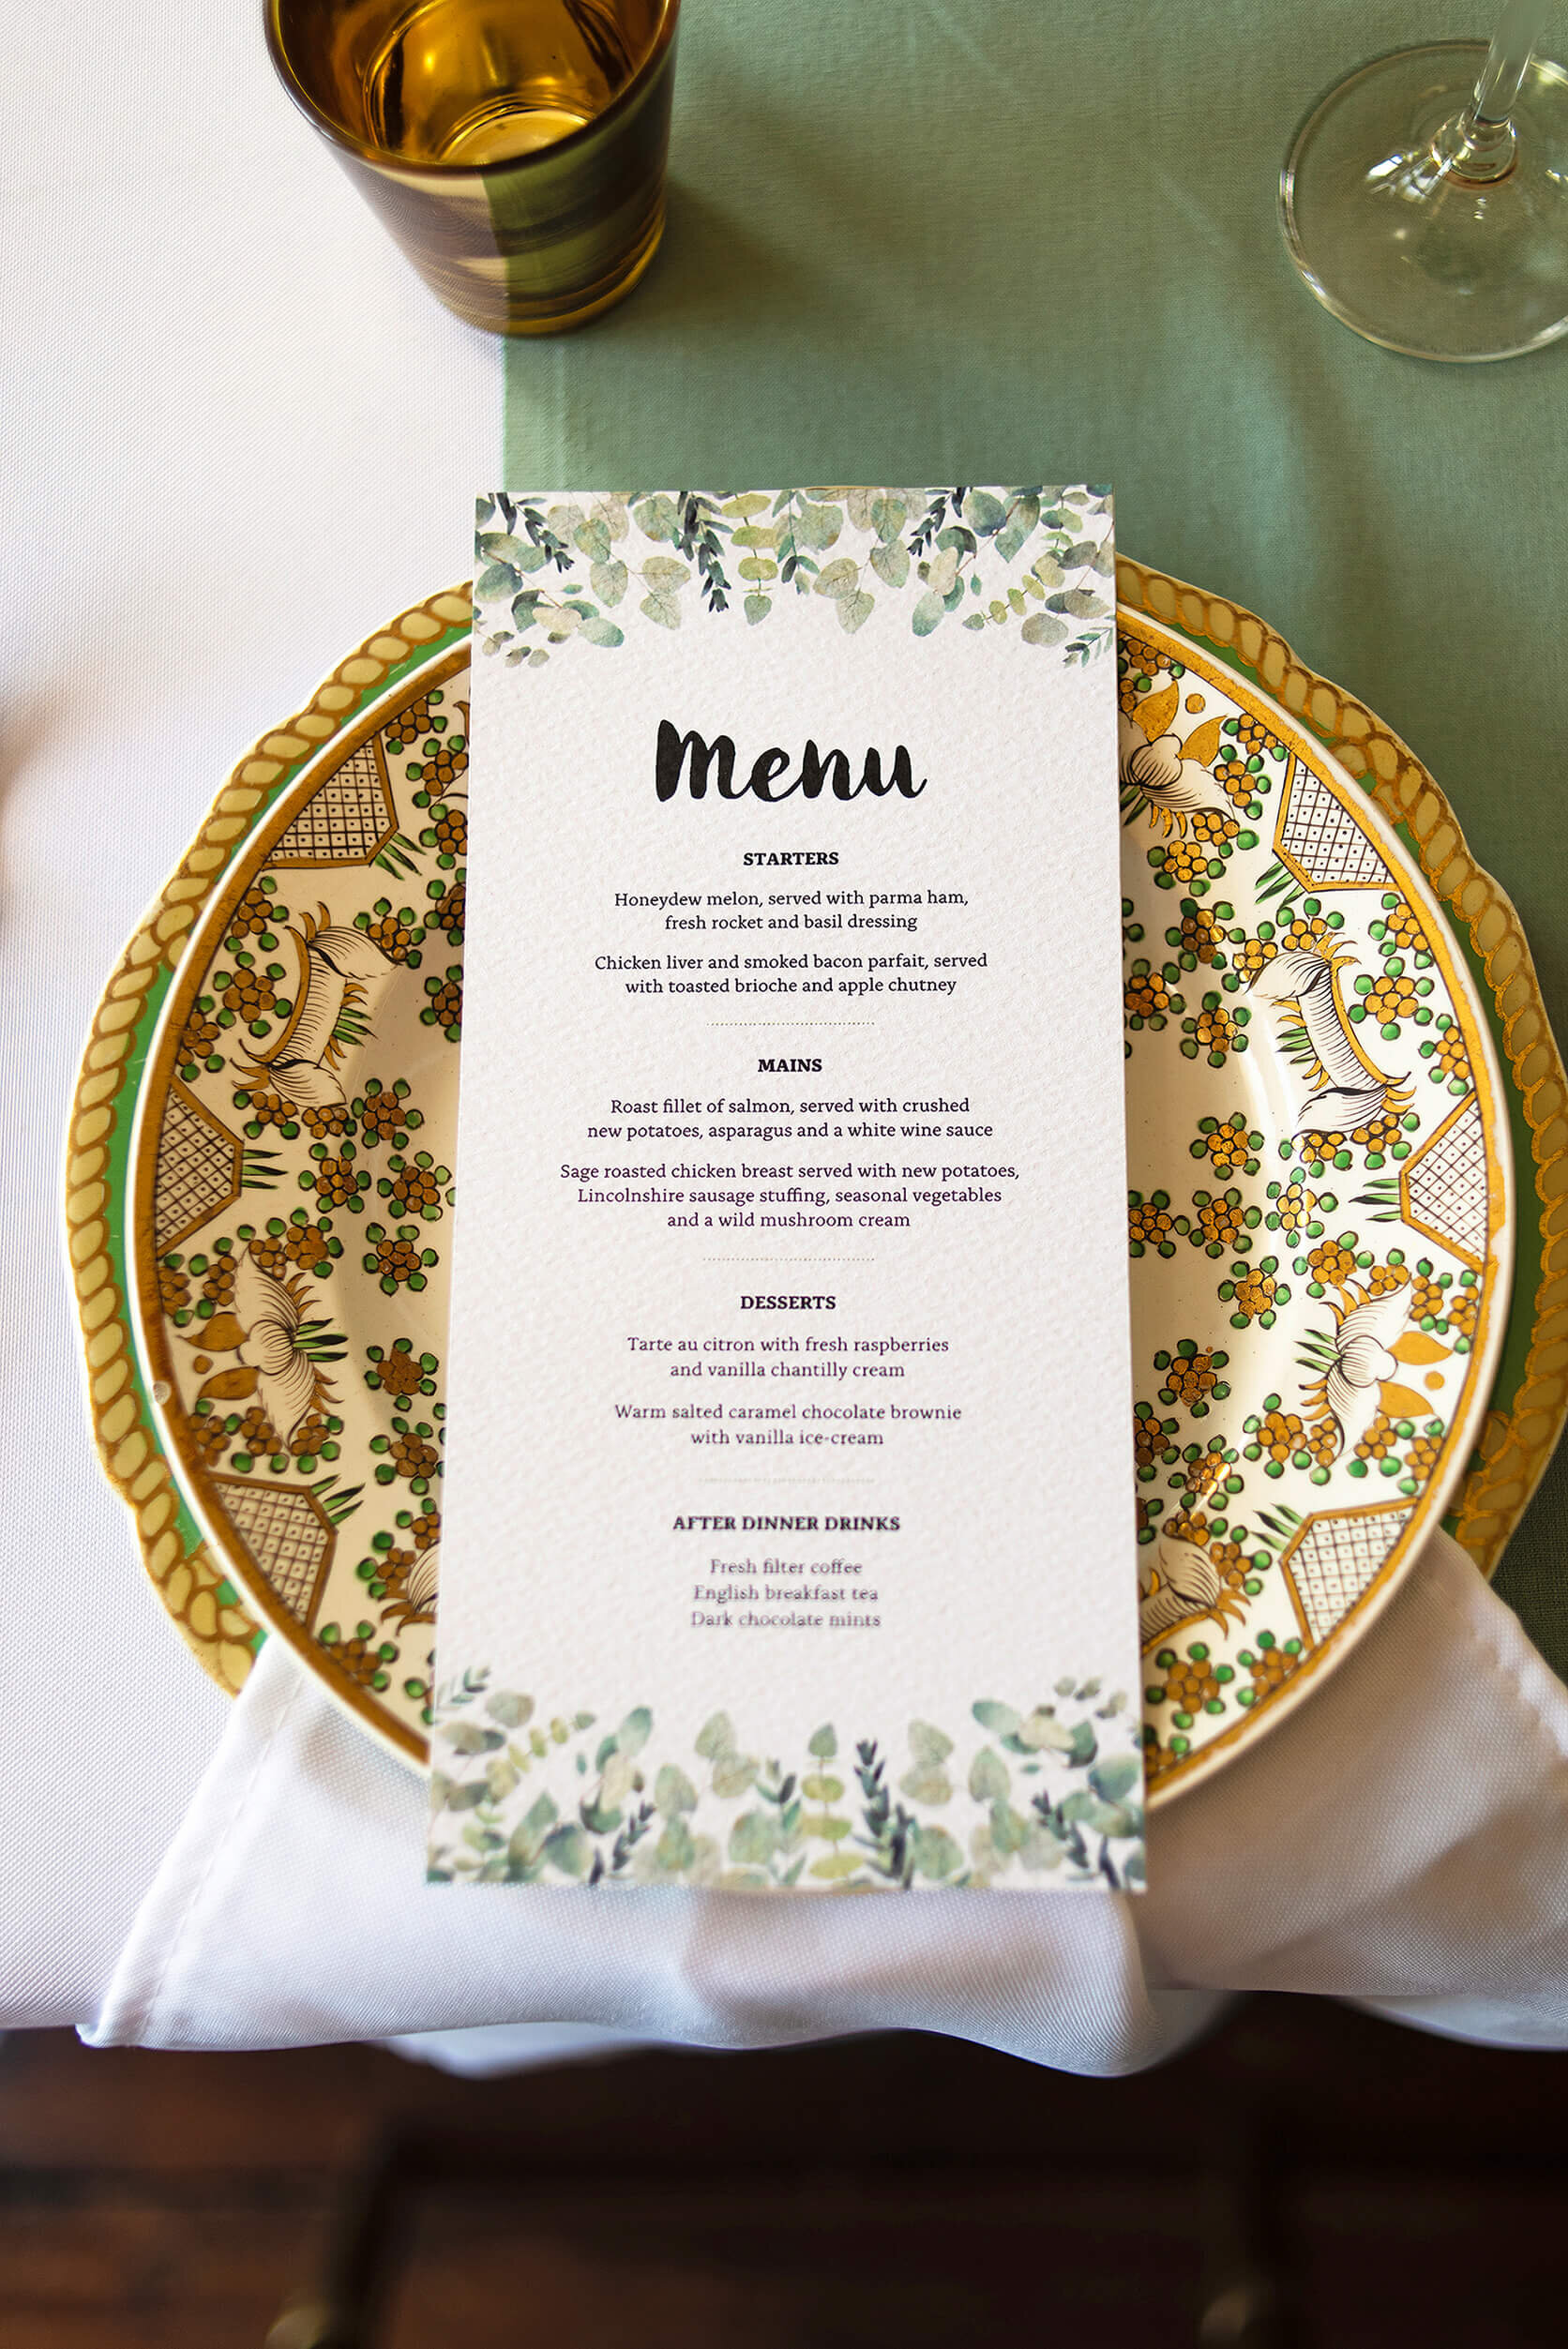 Design By Emily Rustic Eucalyptus Wedding Menu on plate at Nurstead Court Wedding Venue, Kent.